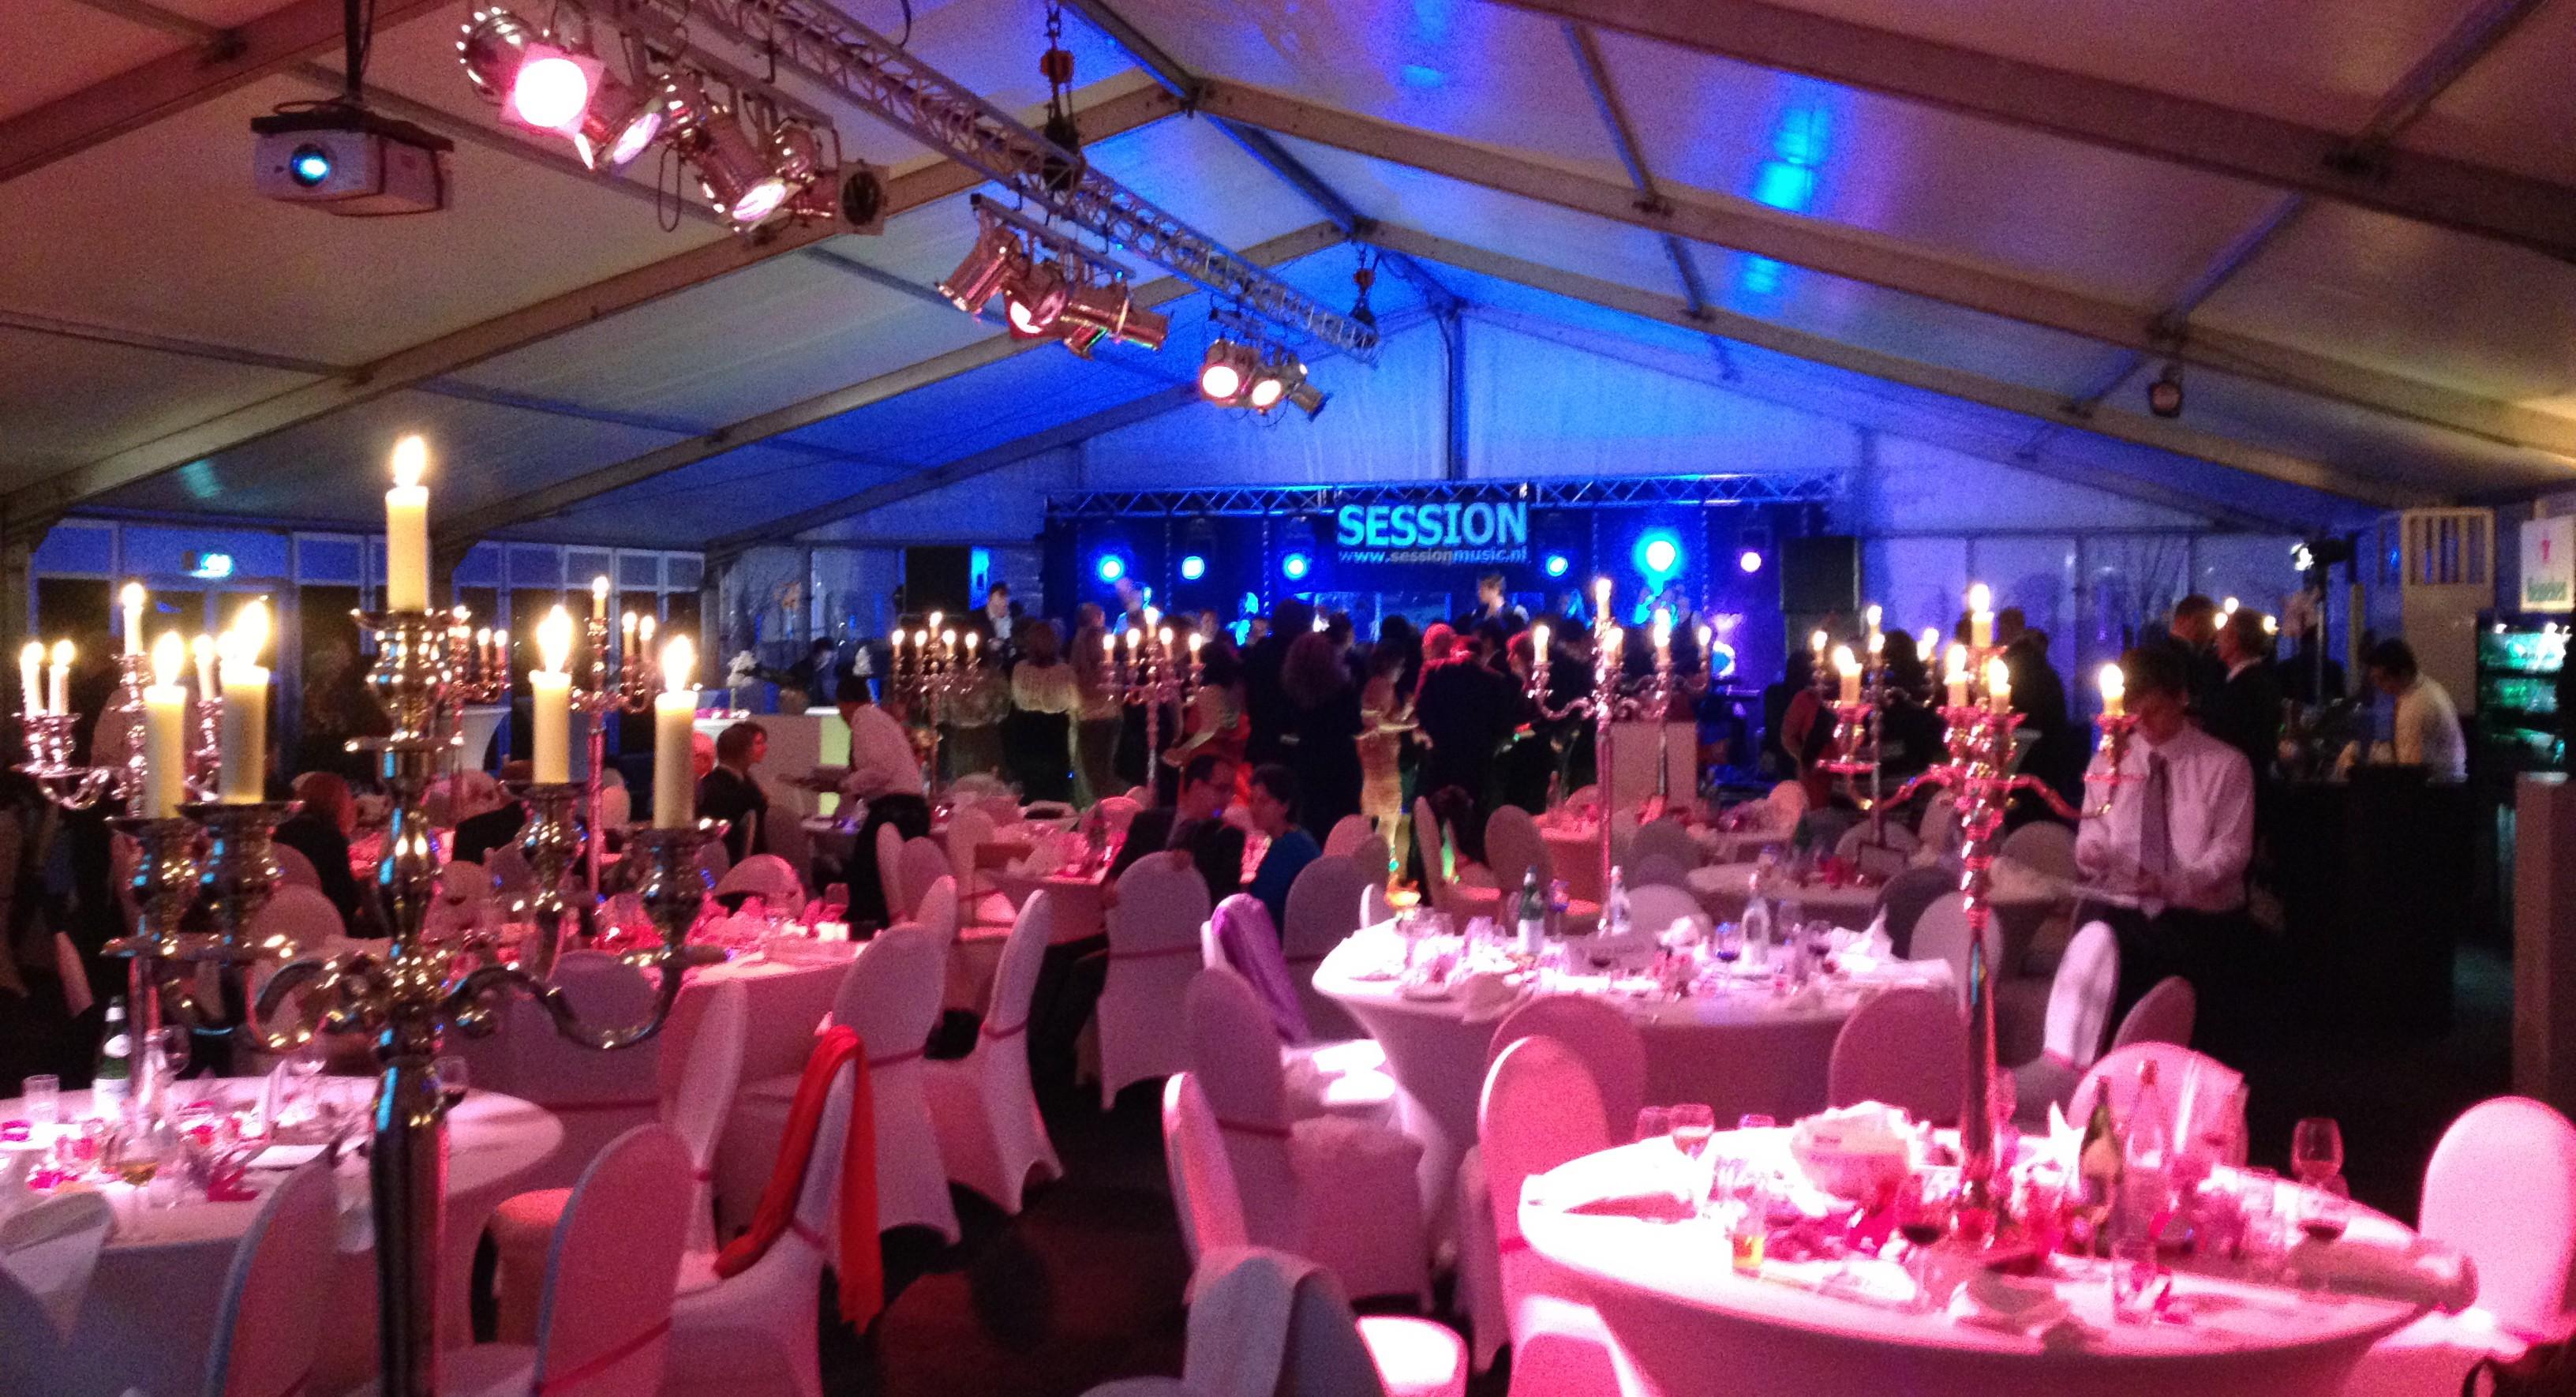 Bruiloft in tent accommodatie jarili bv woning verhuur for Helmers accommodatie en interieur bv